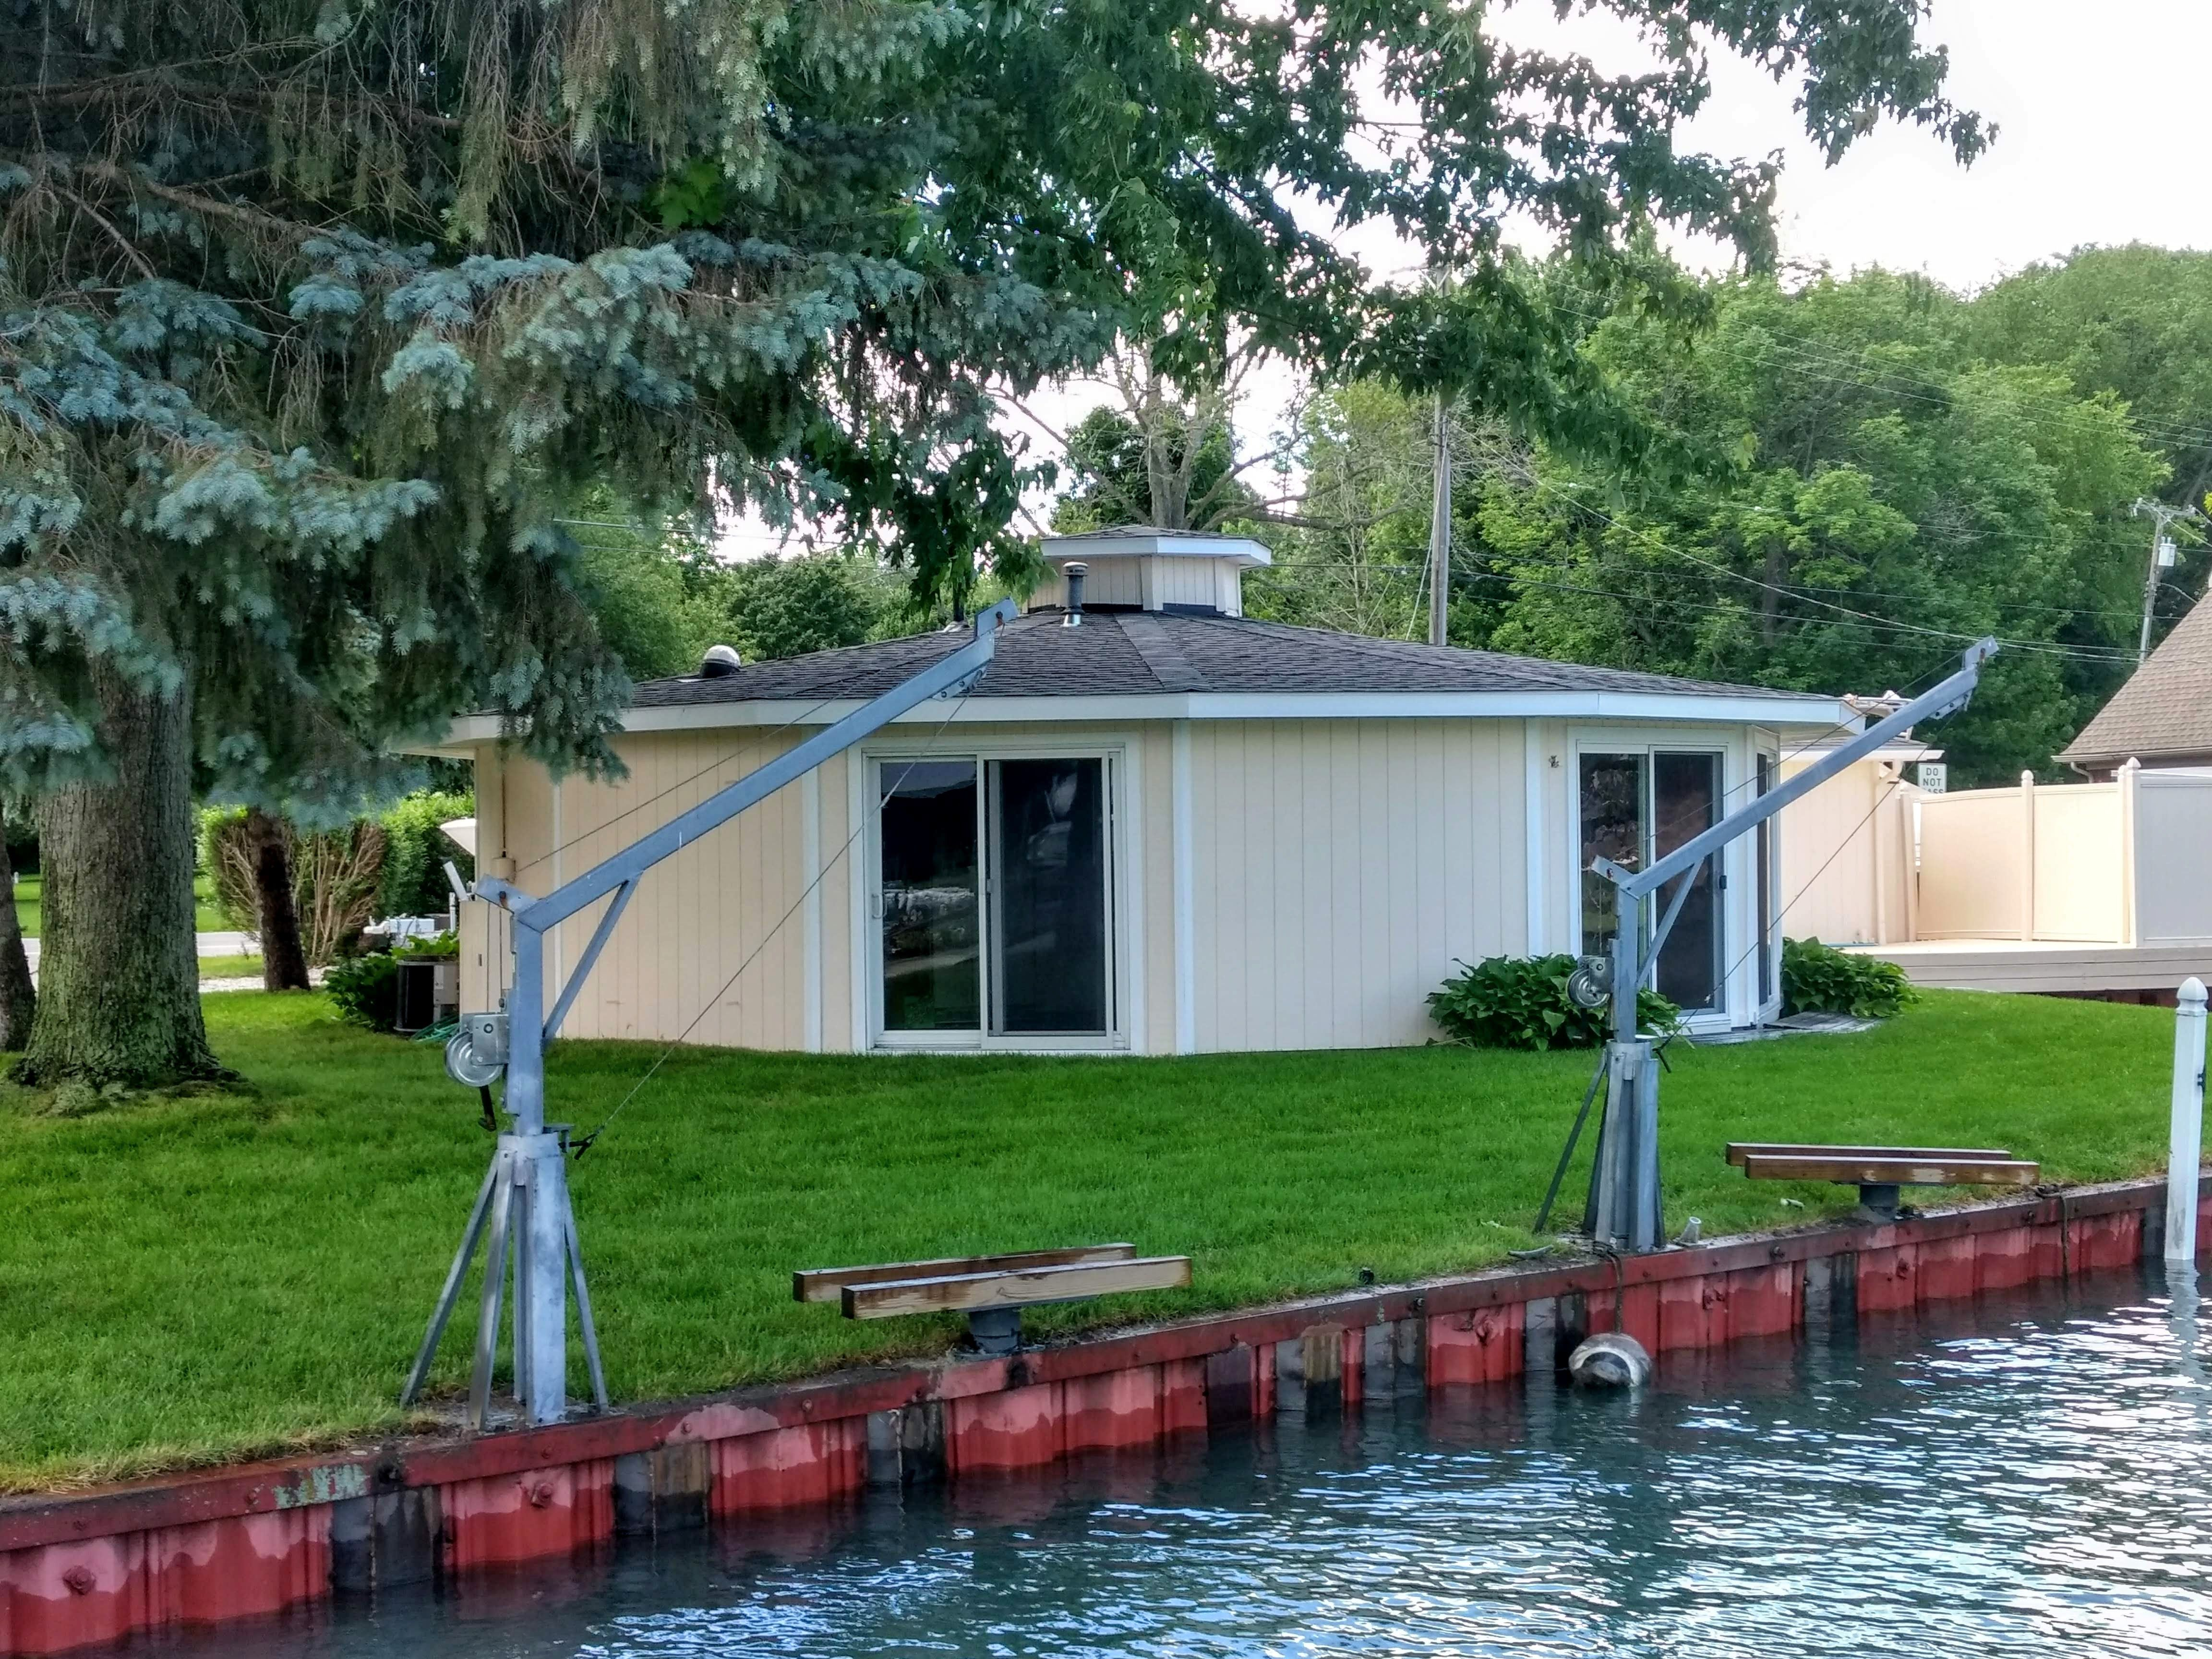 9565 River Rd, Clay Township, MI